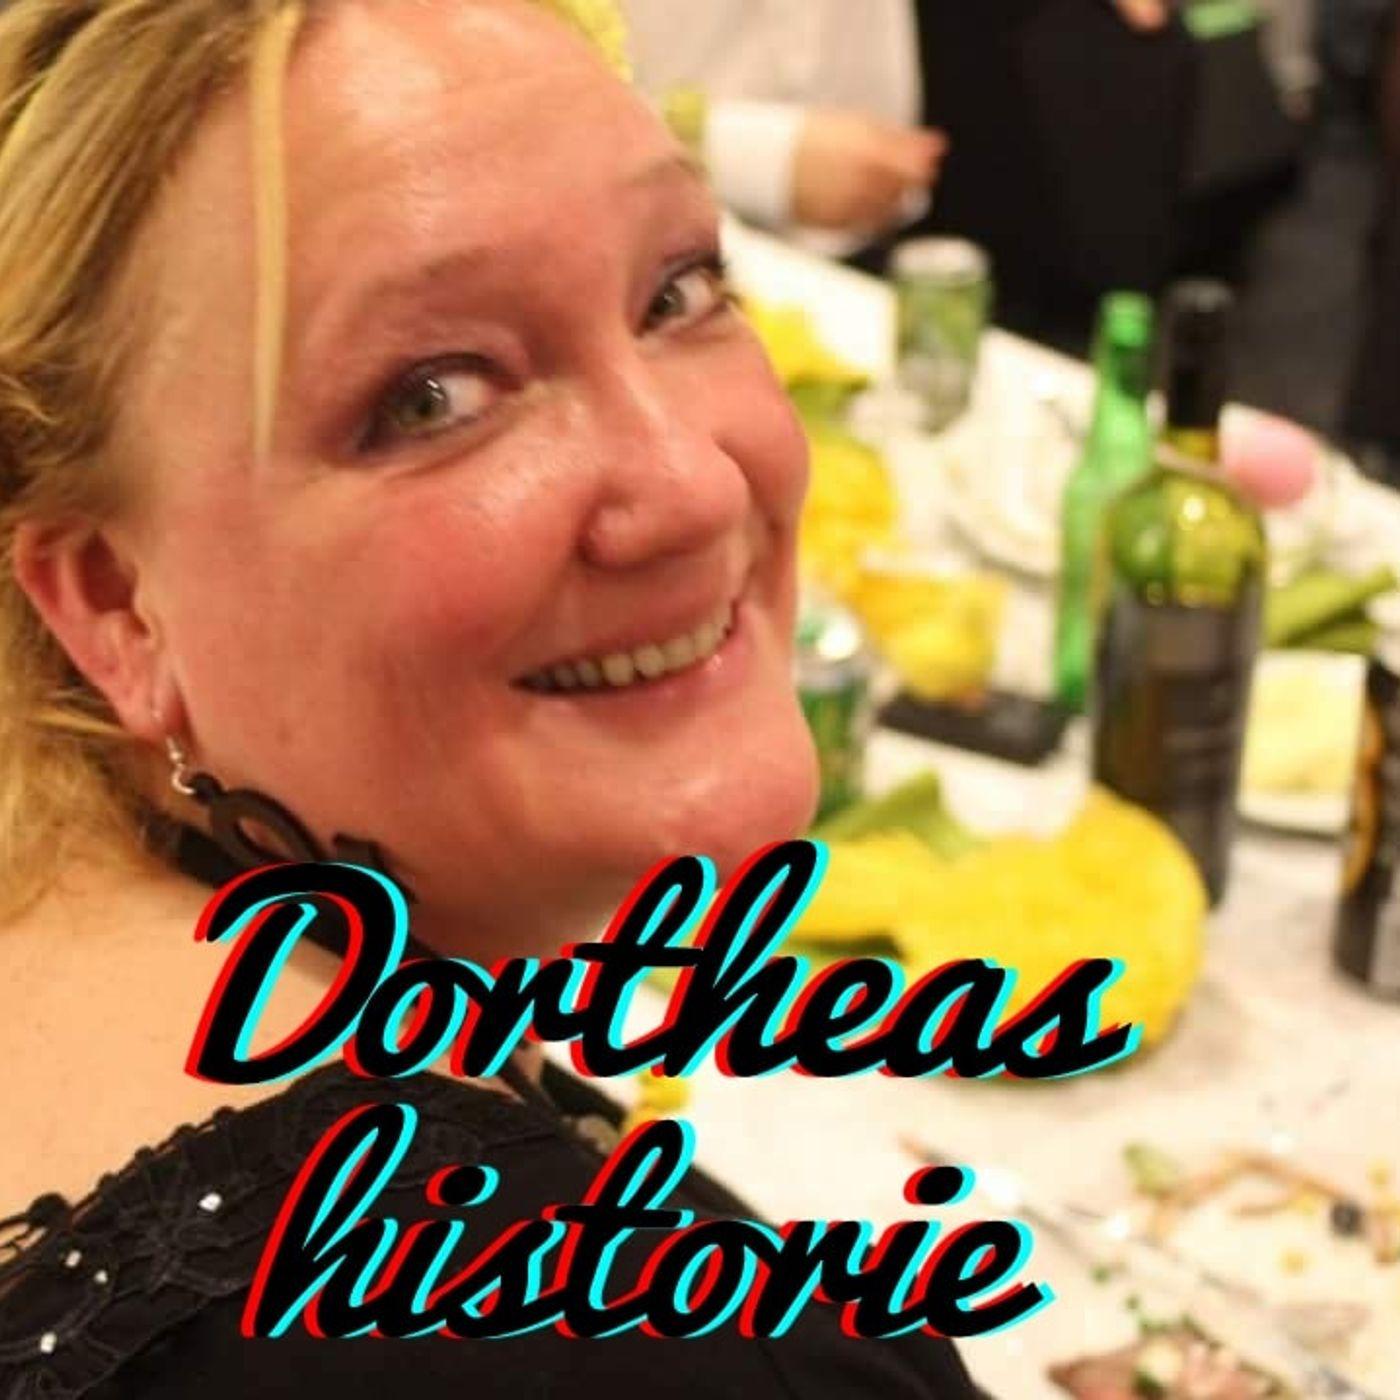 #40: Dortheas historie